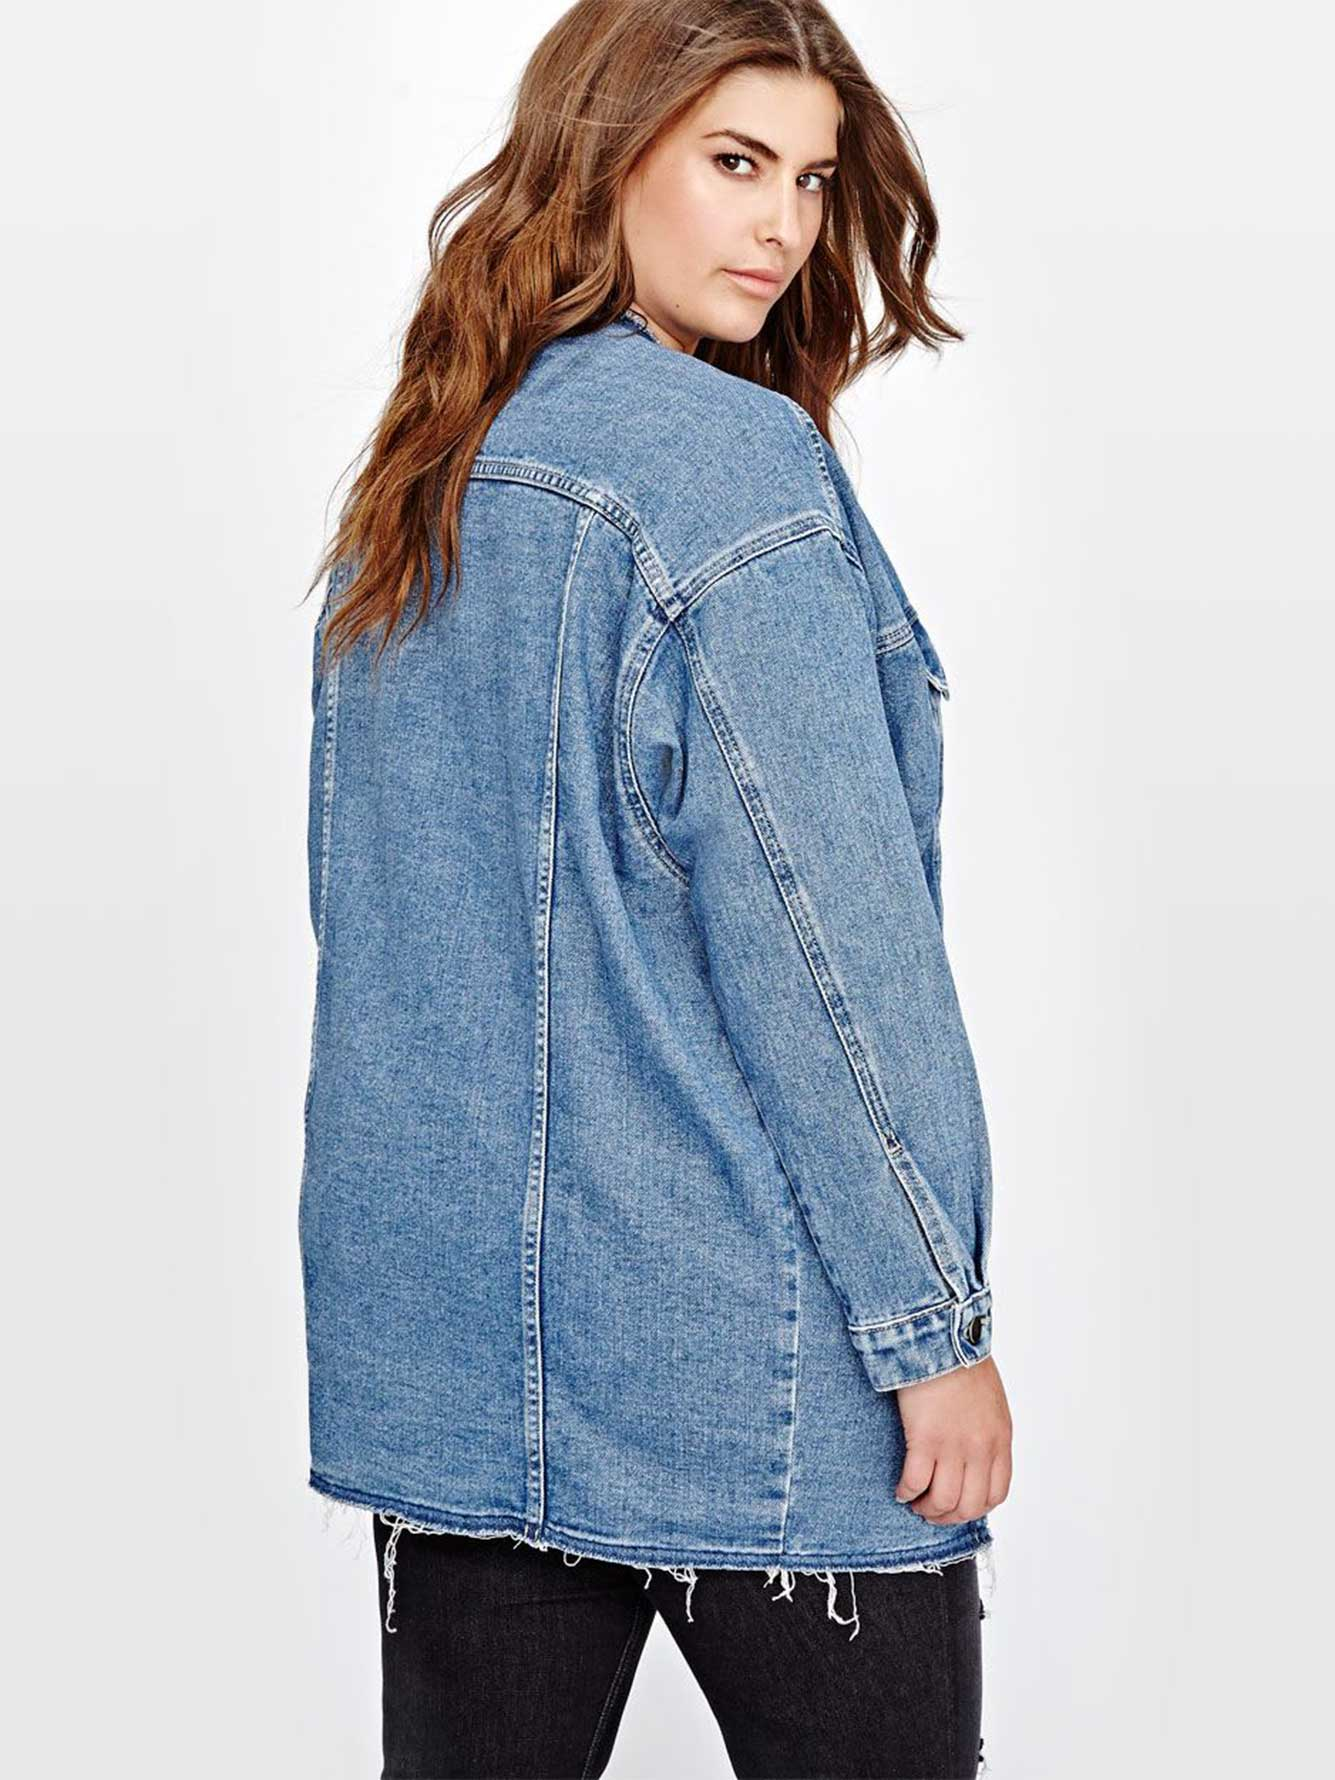 L&L Oversized Boyfriend Denim Jacket | Addition Elle